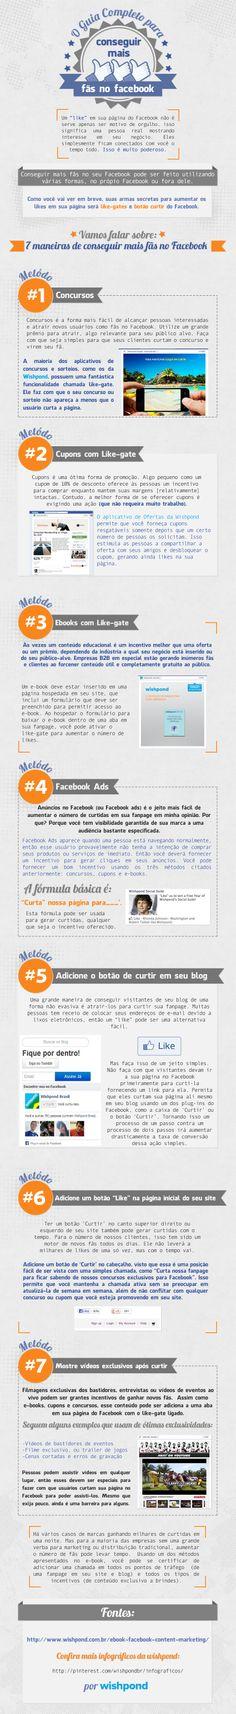 Facebook, Marketing Digital, Instagram, Business, Design, Social Networks, Advertising, Entrepreneurship, Glass Display Case